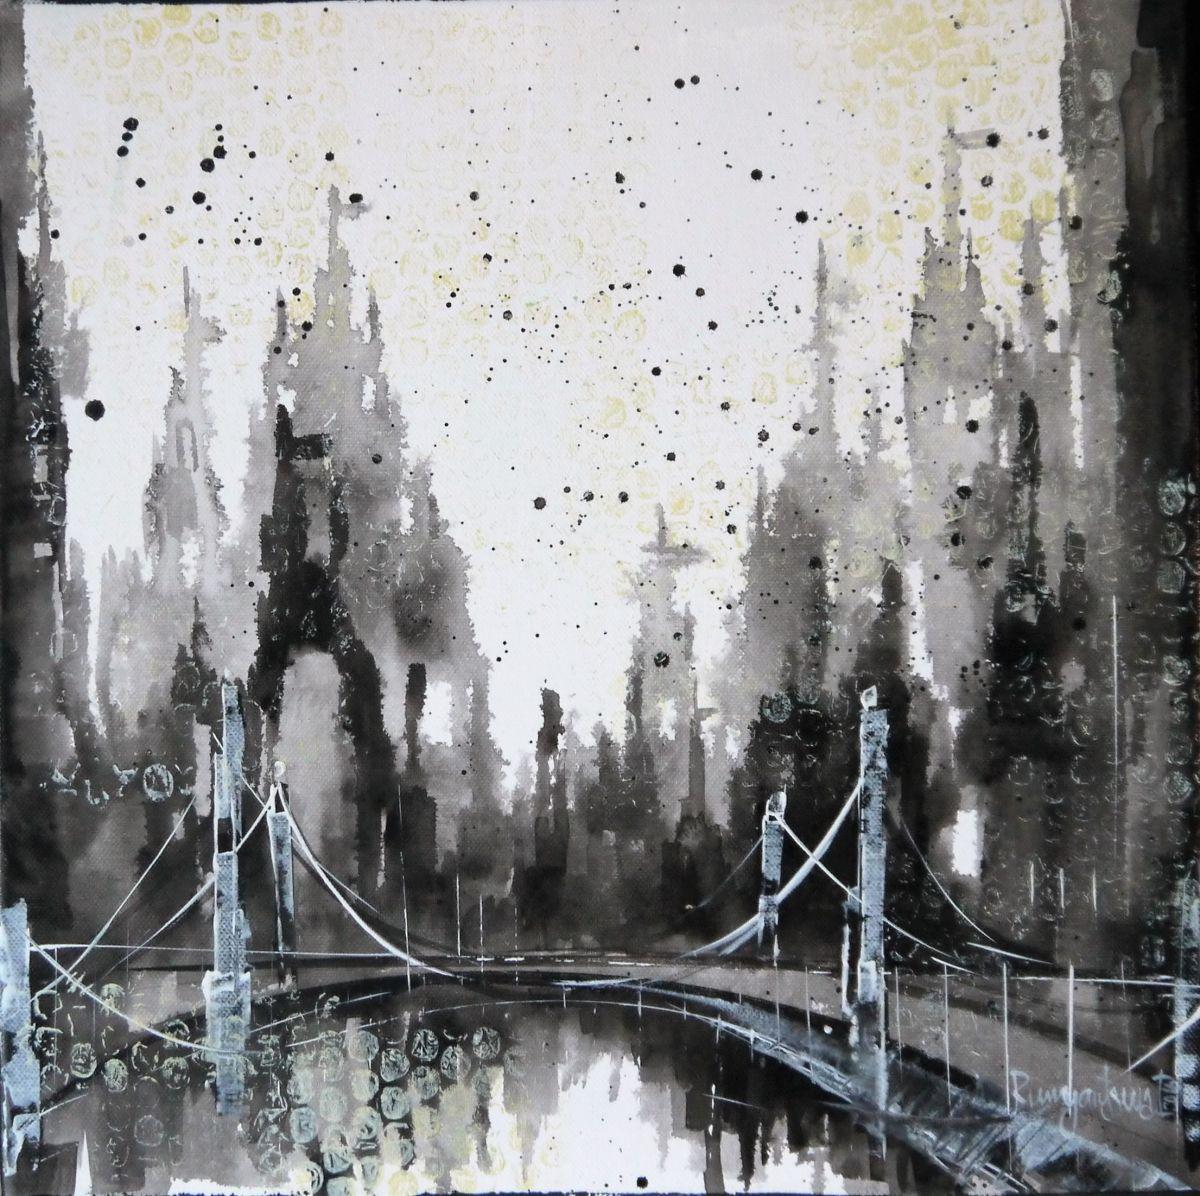 Black And White Skyline 2016 Acrylic Painting By Irina